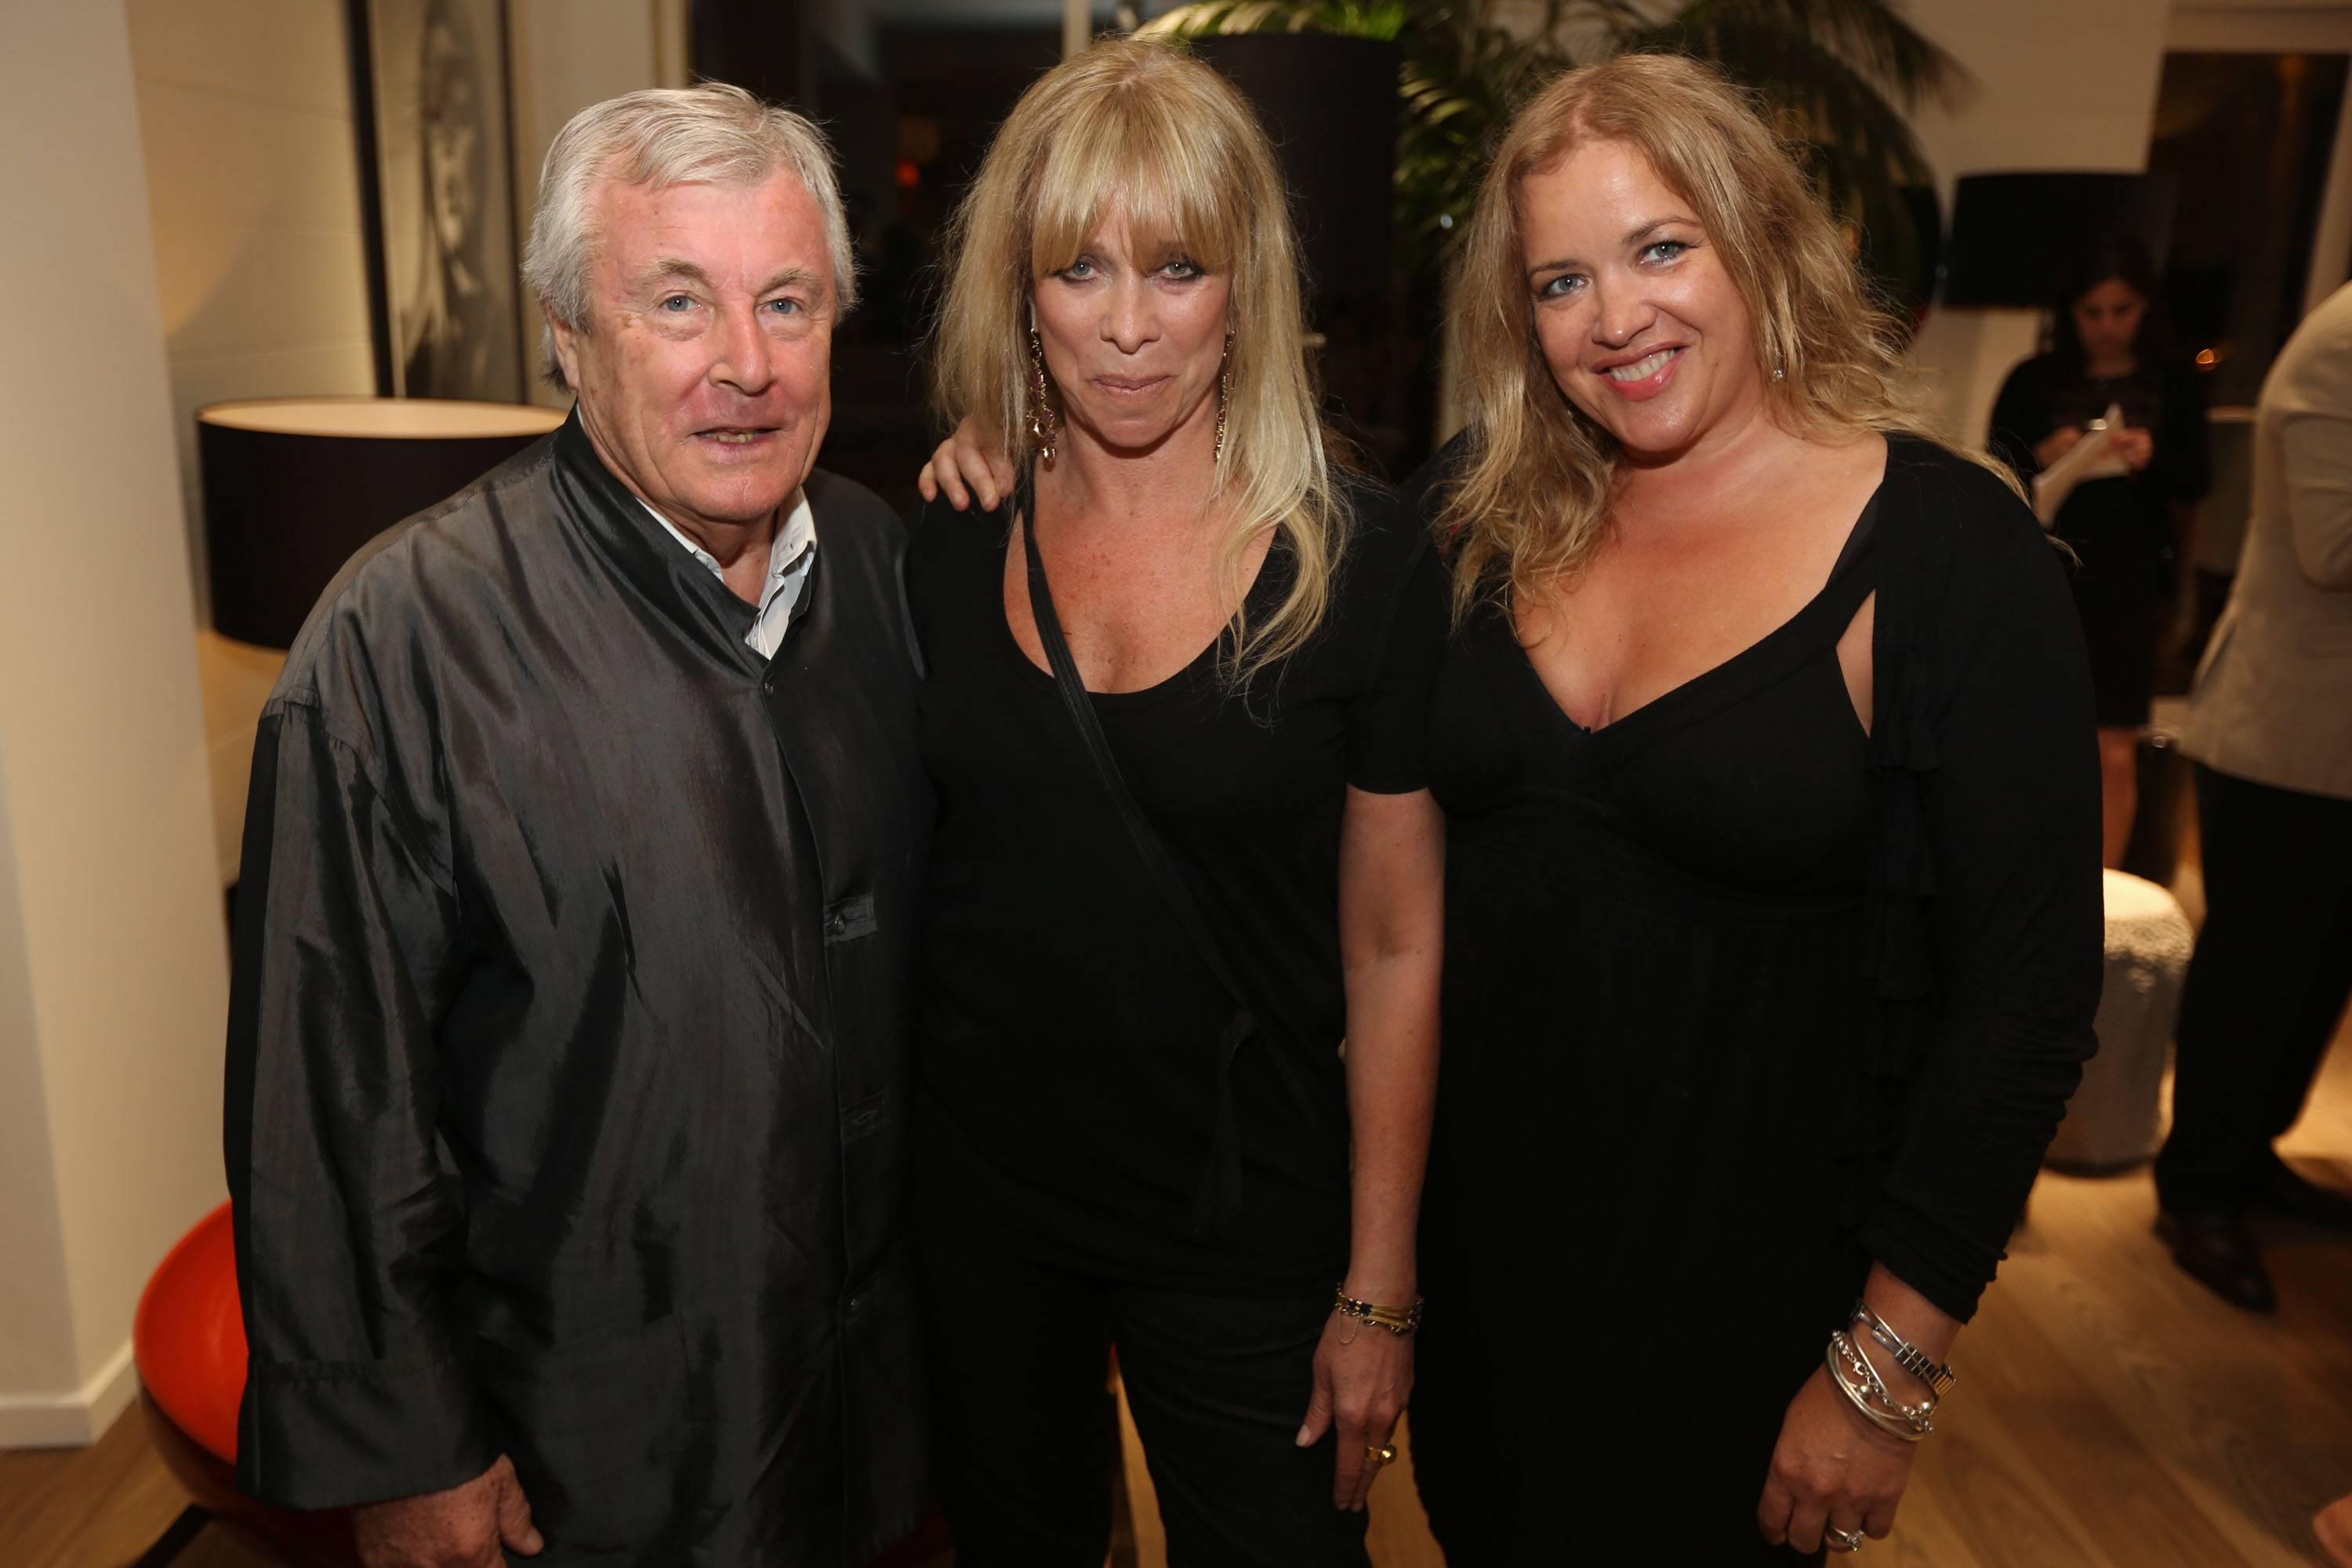 Terry O'Neill, Jo Wood, & Lize Mccarron